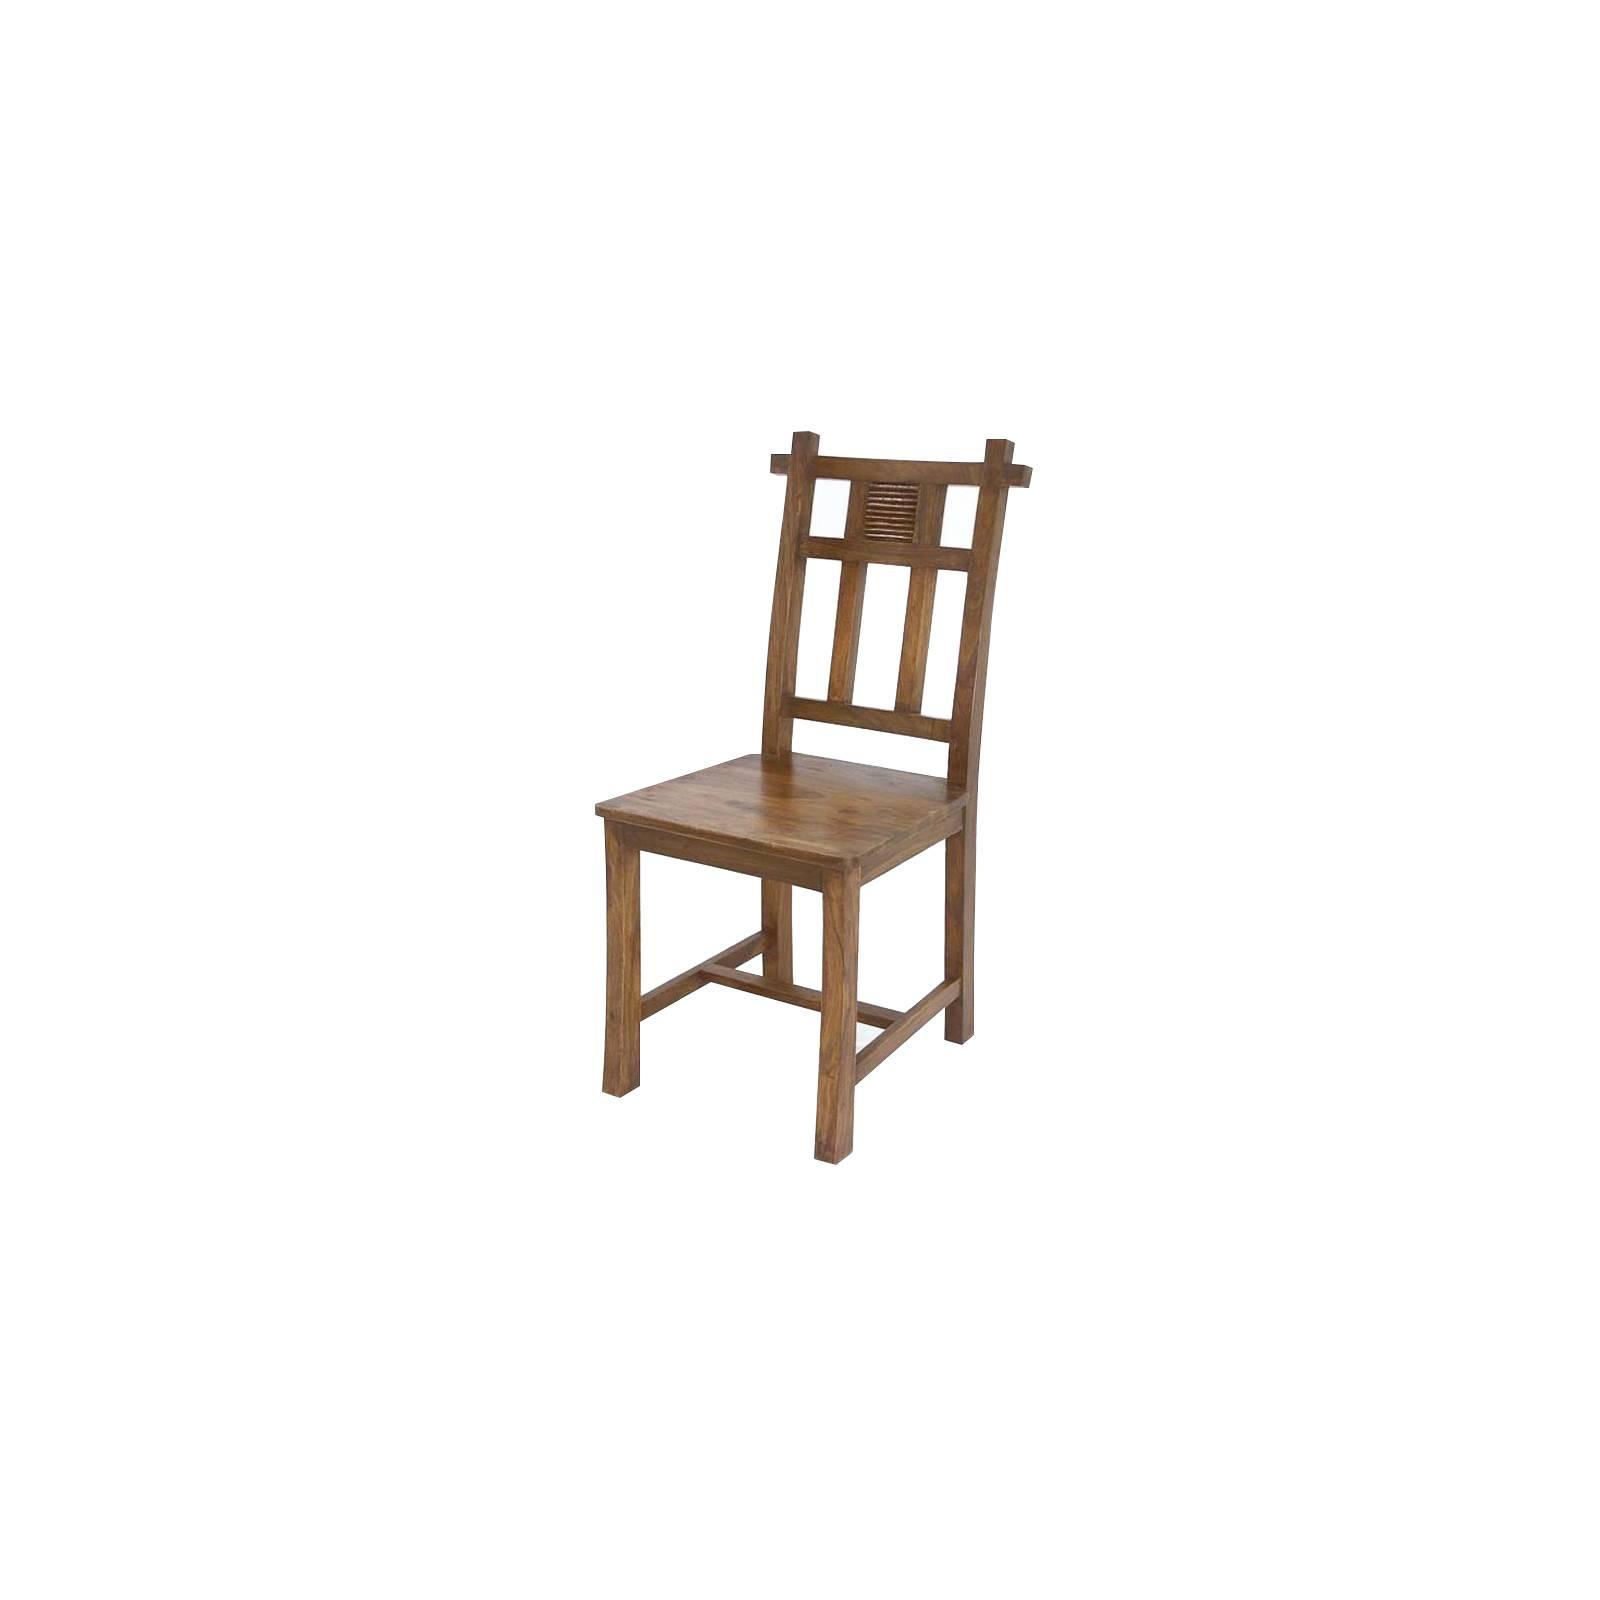 Chaise au style africain primitif